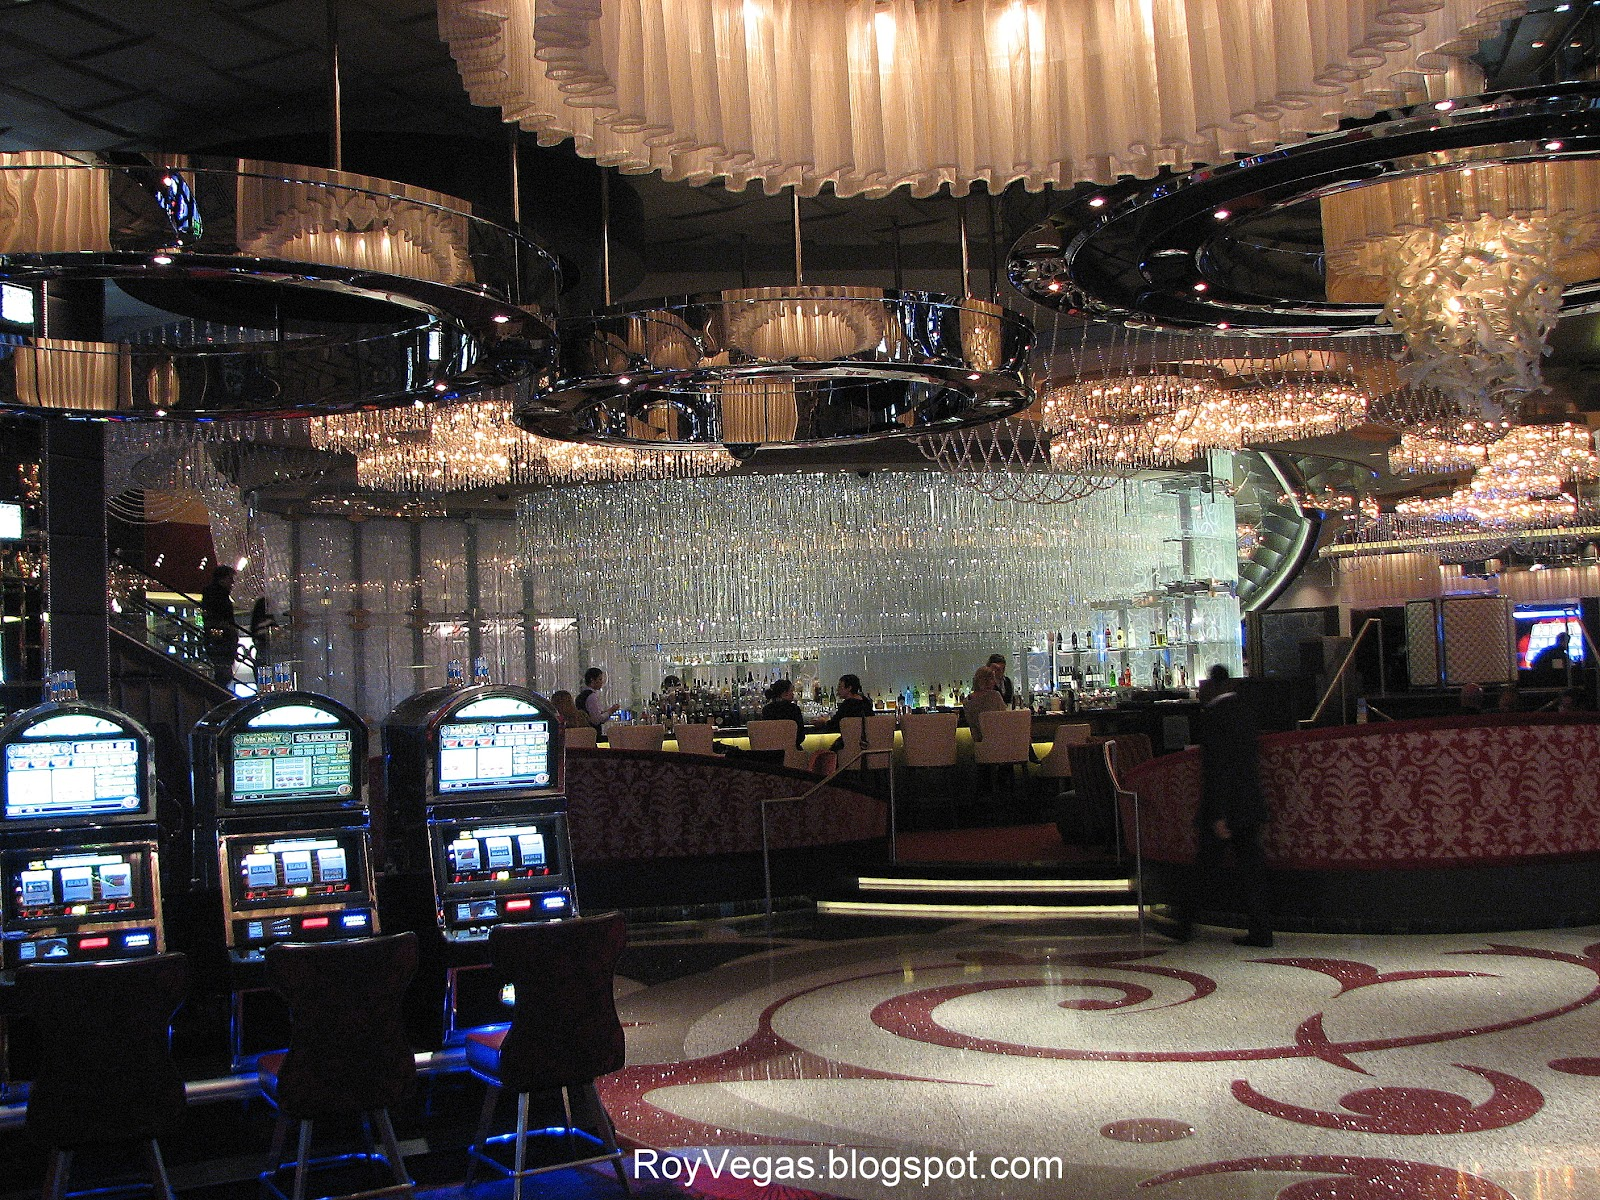 Roy Vegas Cosmopolitan Las Vegas